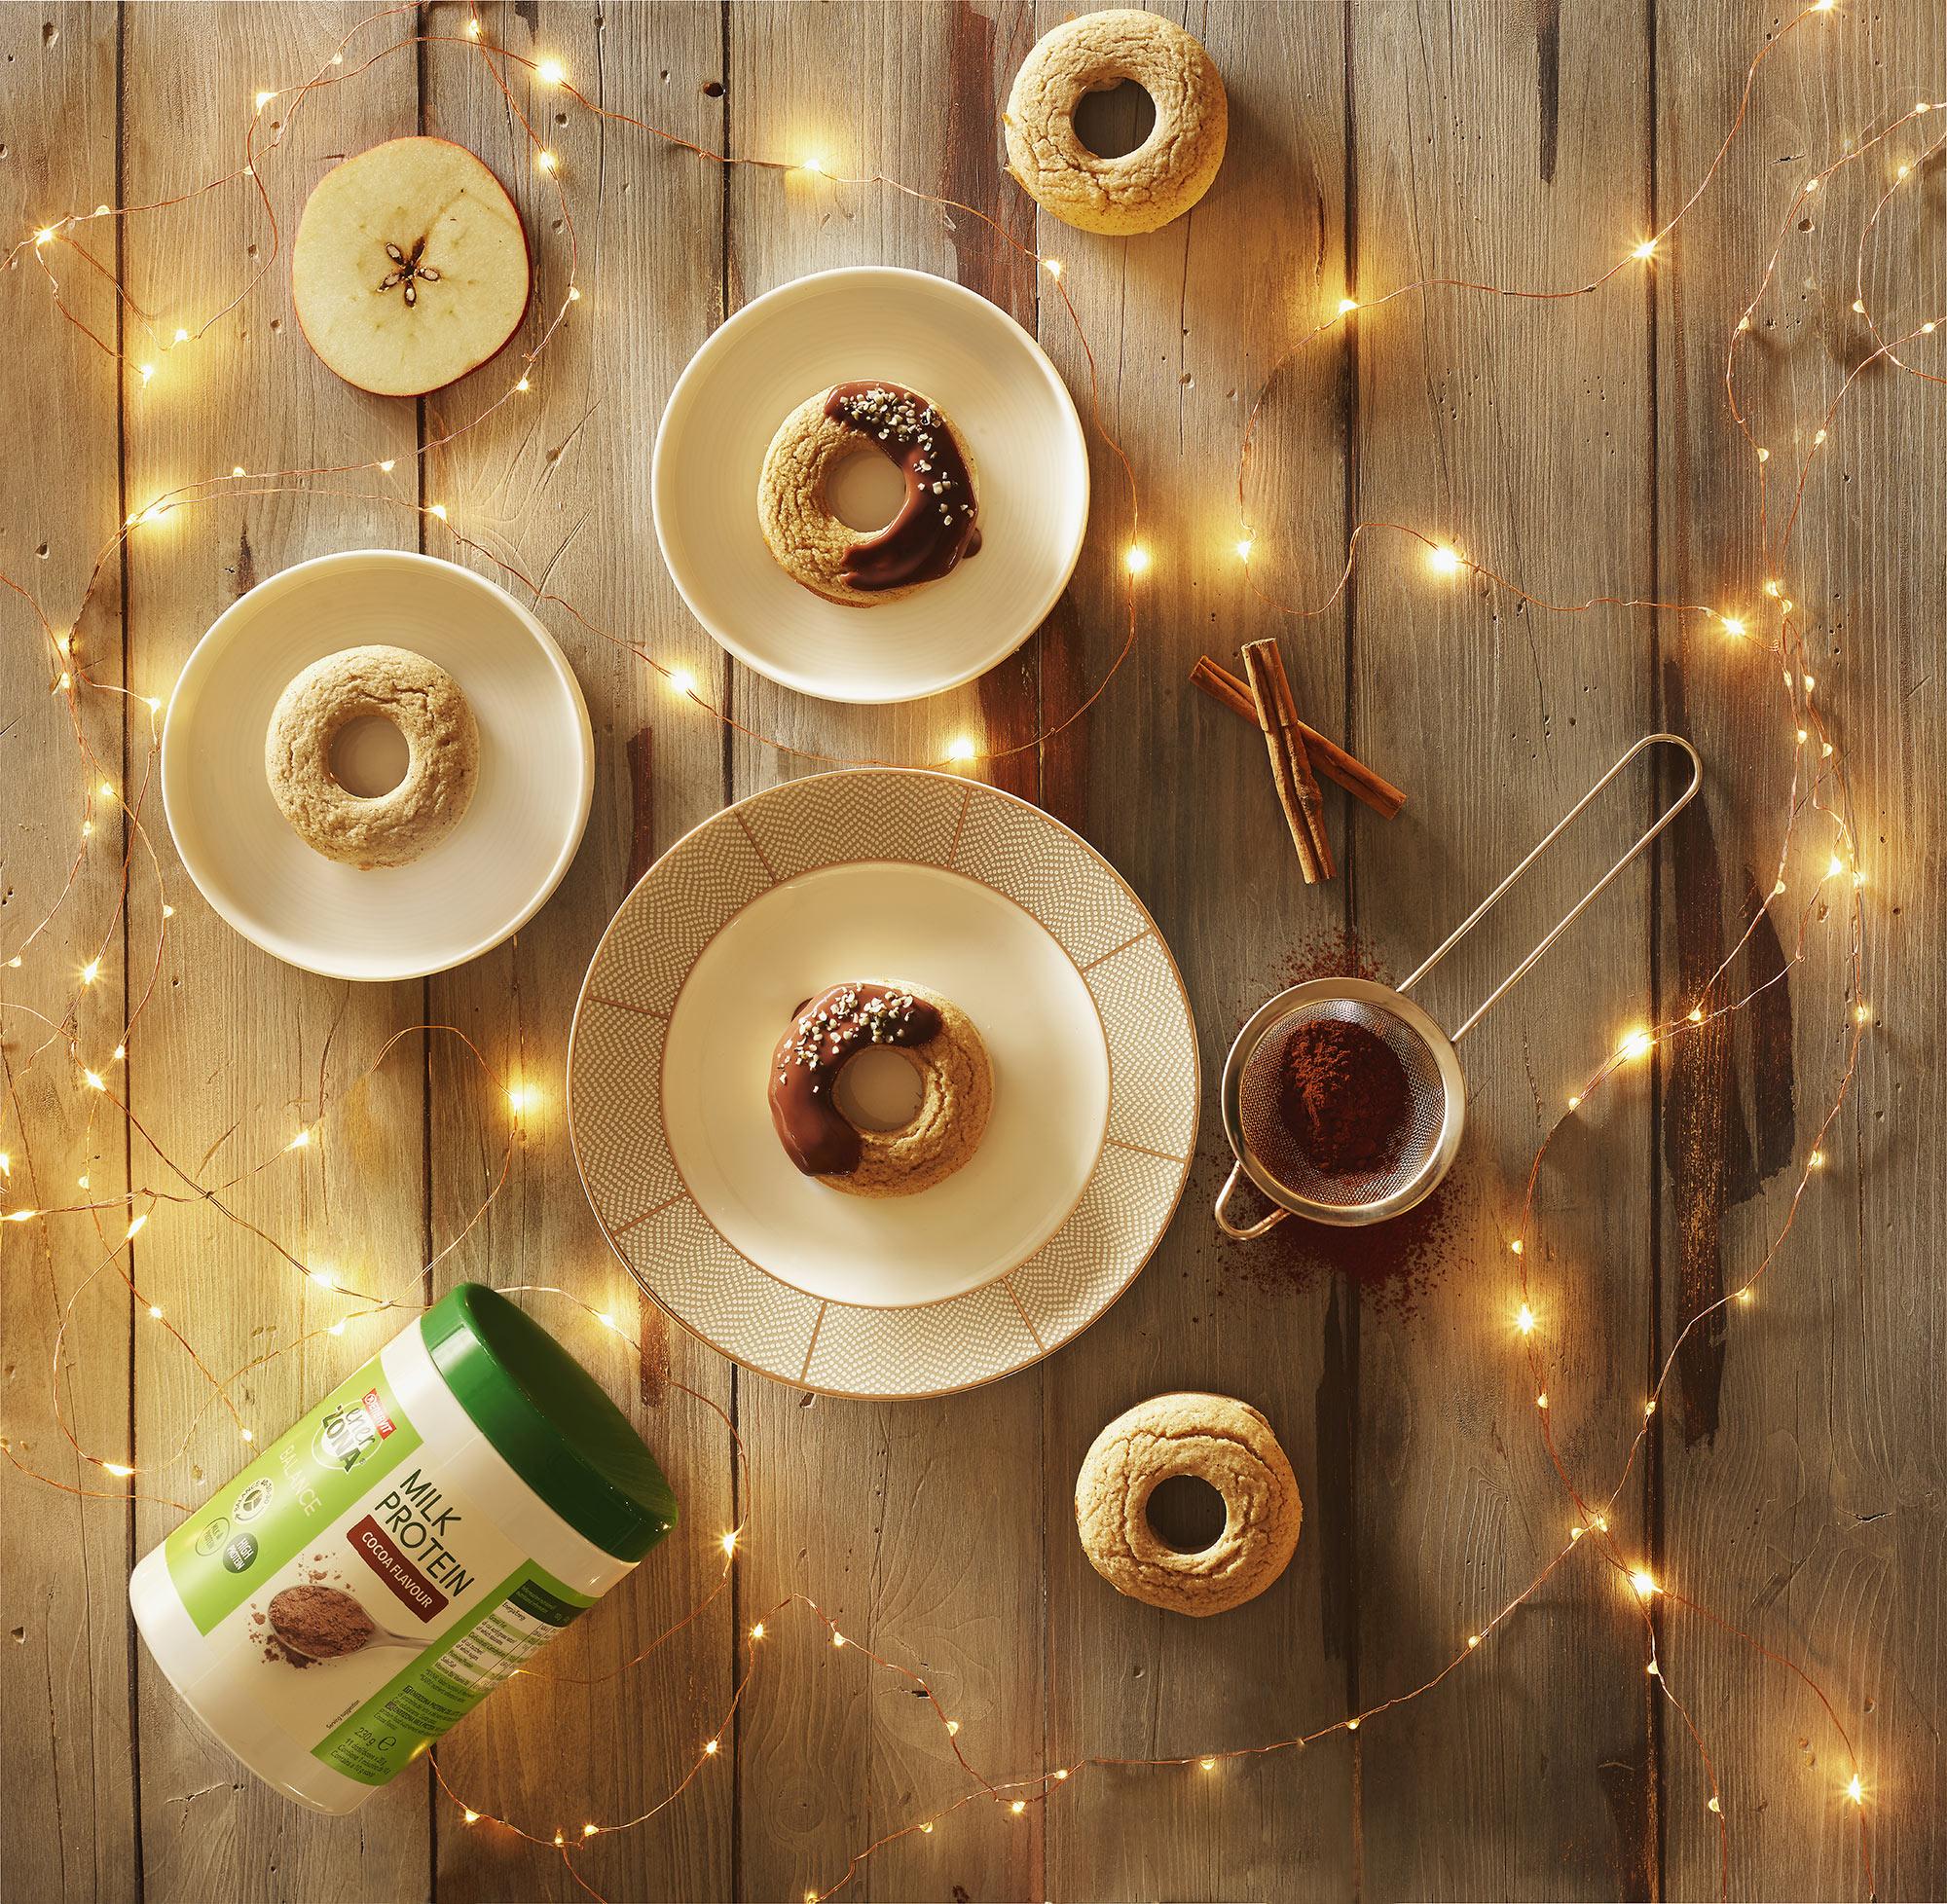 Enerzona Milk Protein Biscotti Food Shot by Fotografando